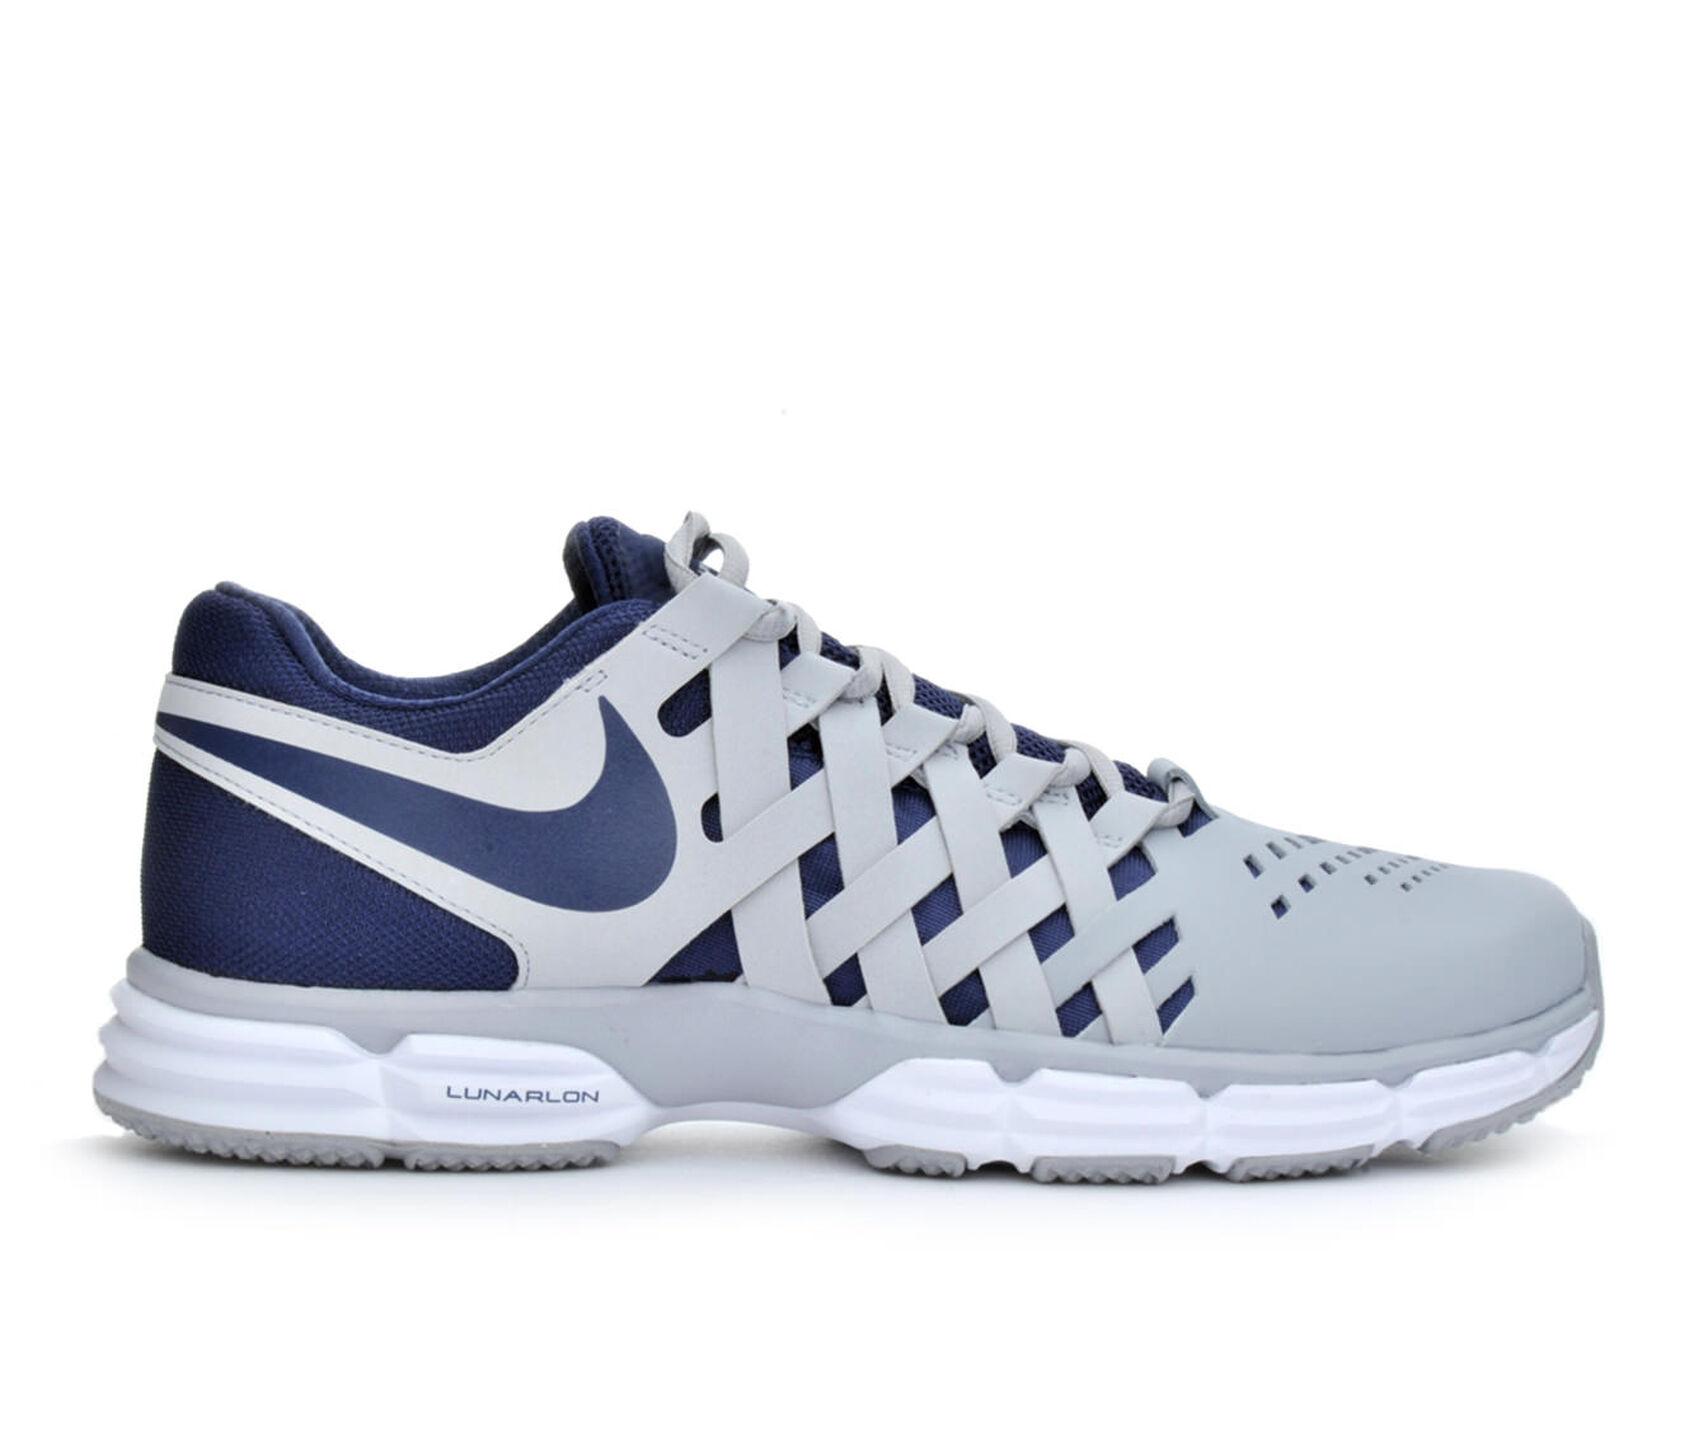 Nike Basketball Shoes Wide Mens